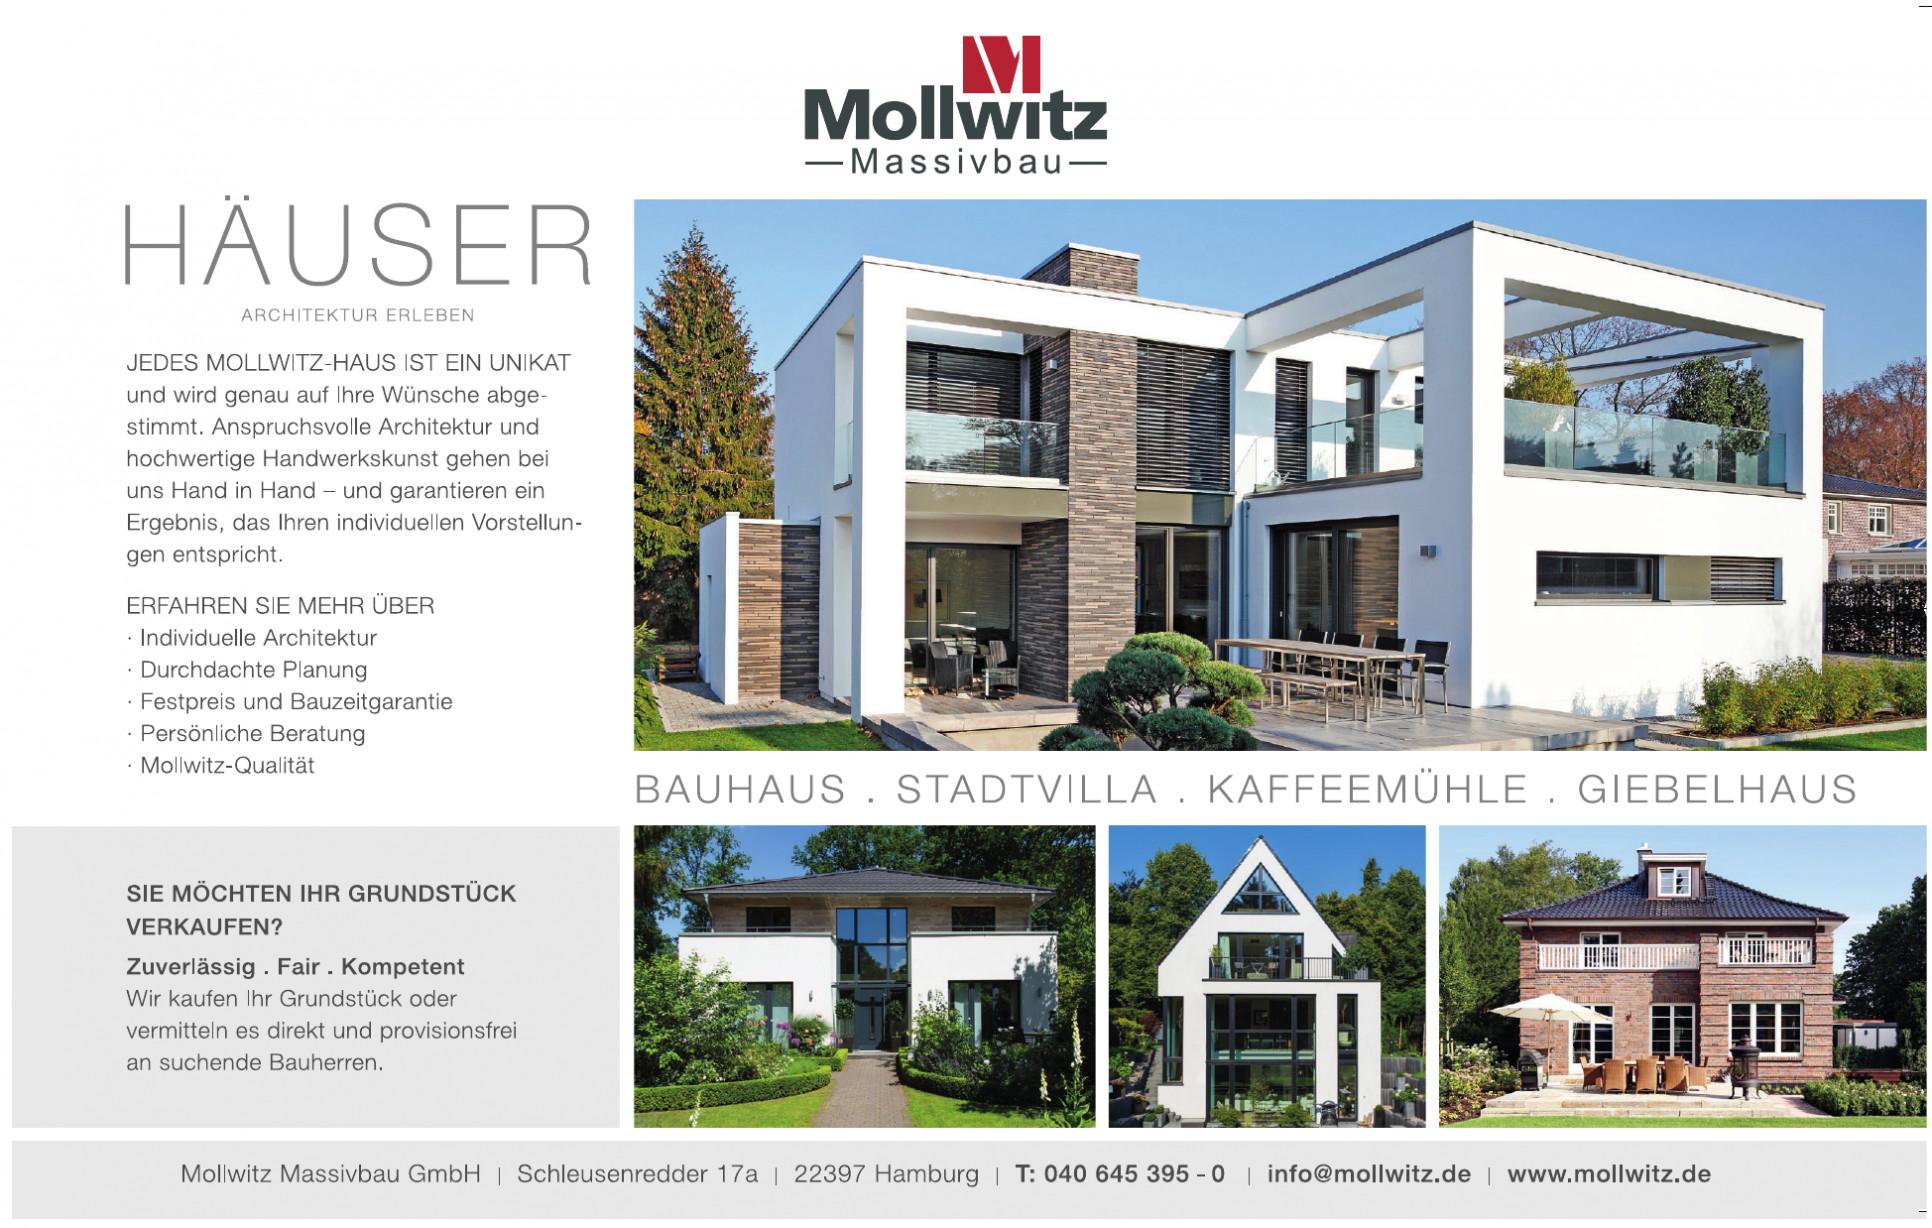 Mollwitz Masivbau GmbH